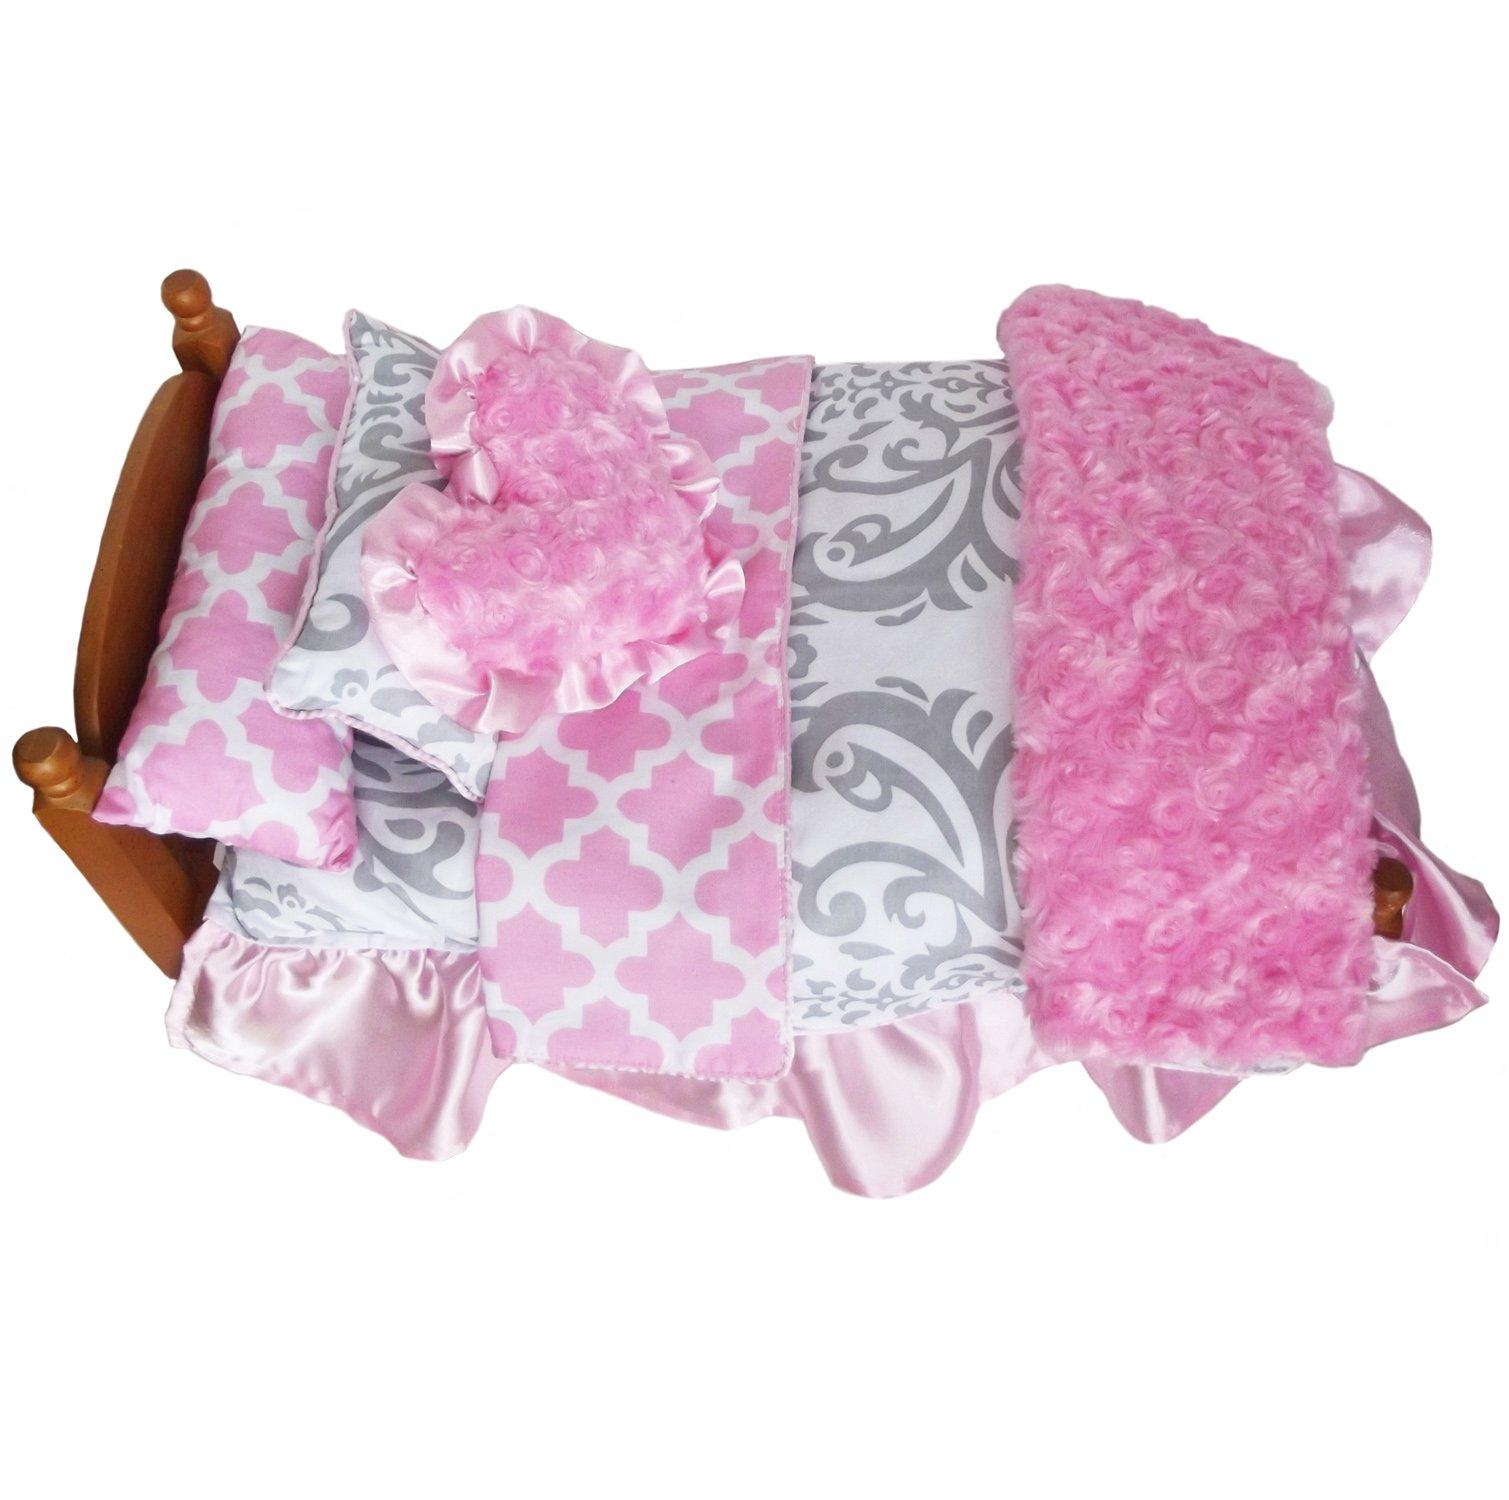 AnnLoren 7pc Pink Lattice & Grey Damask Bedding Set made for AG Dolls